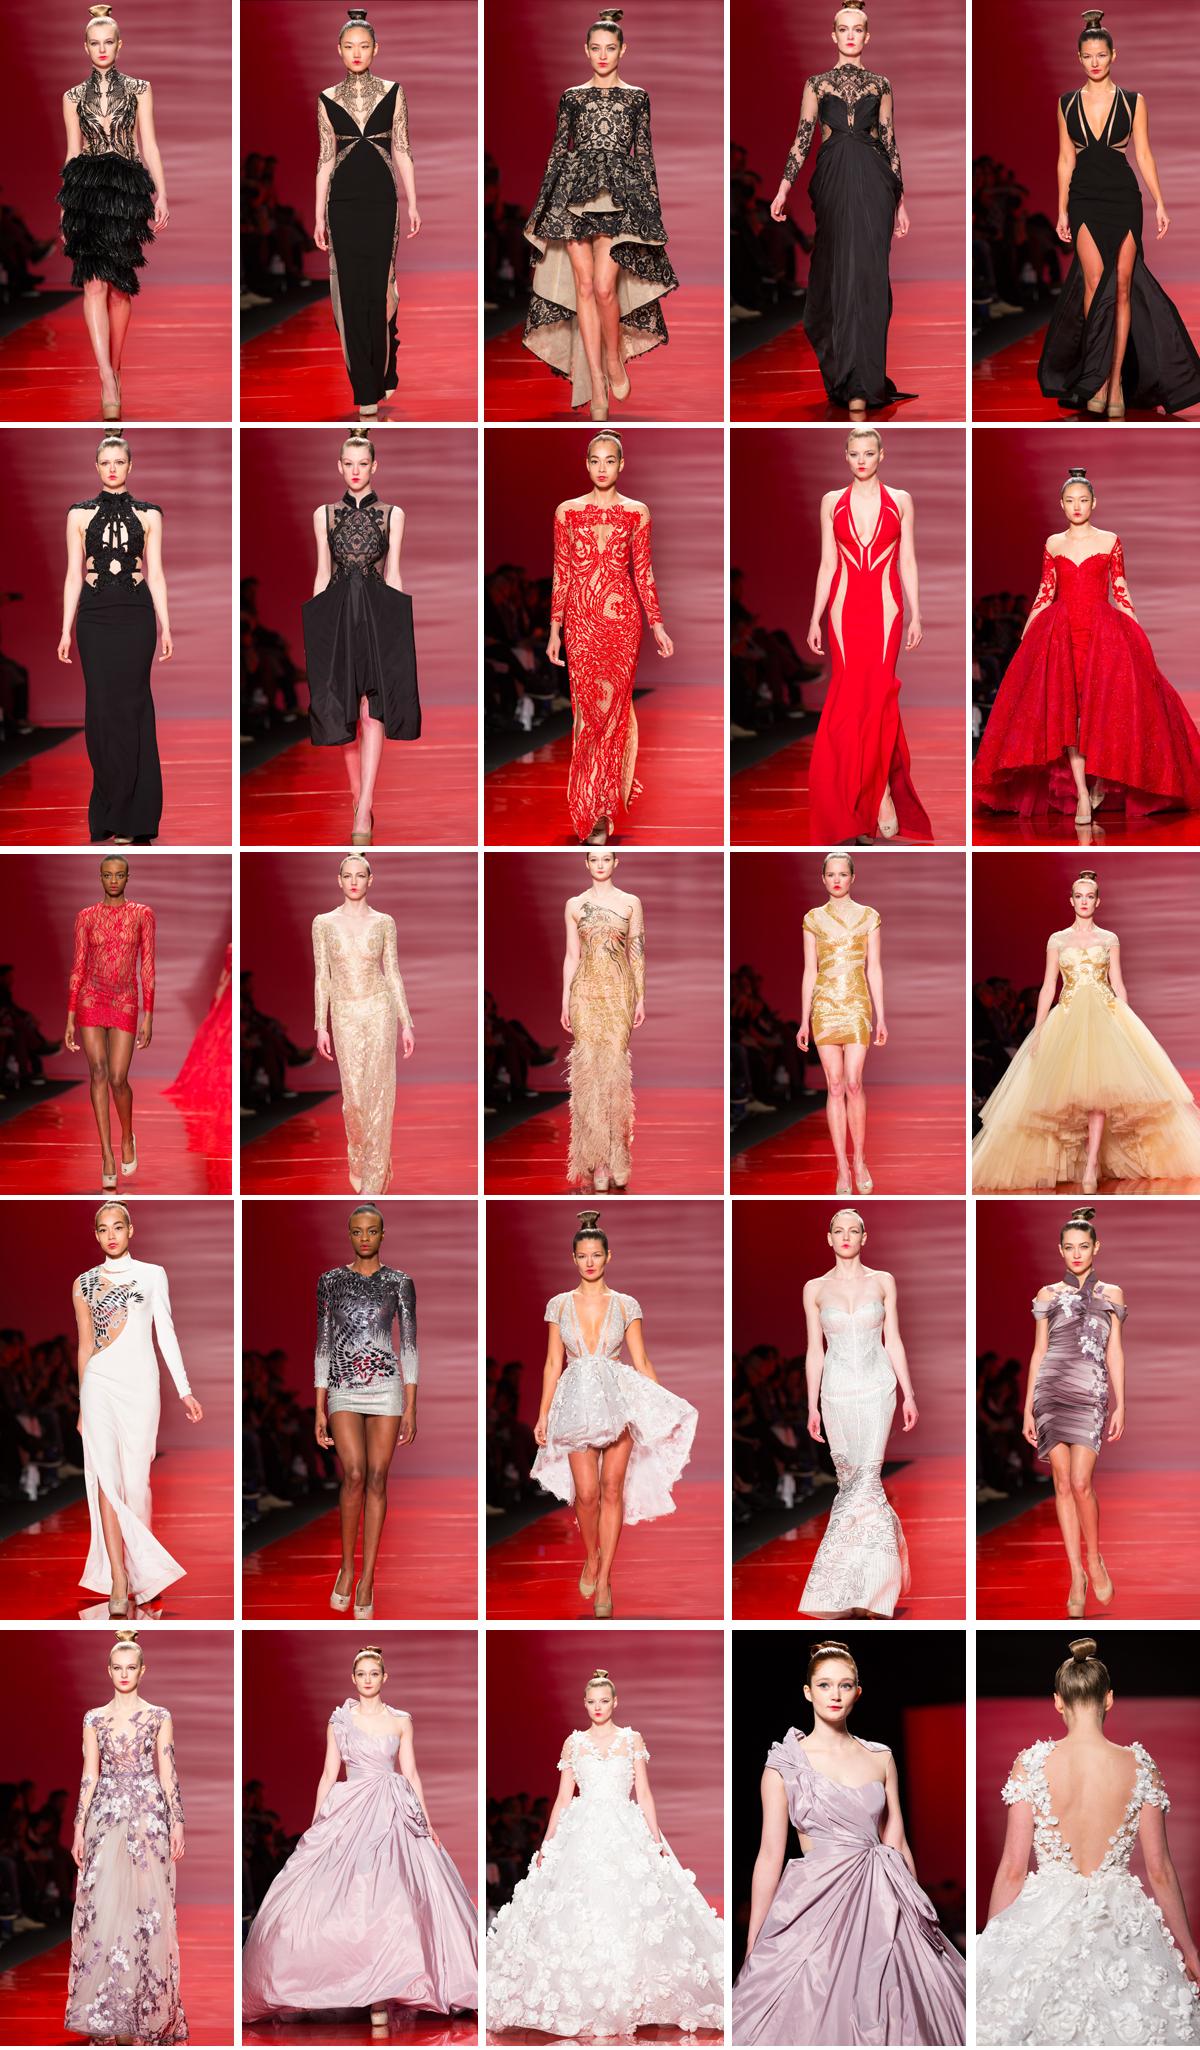 mikael d fall winter 2015 world mastercard fashion week toronto fashion week 01